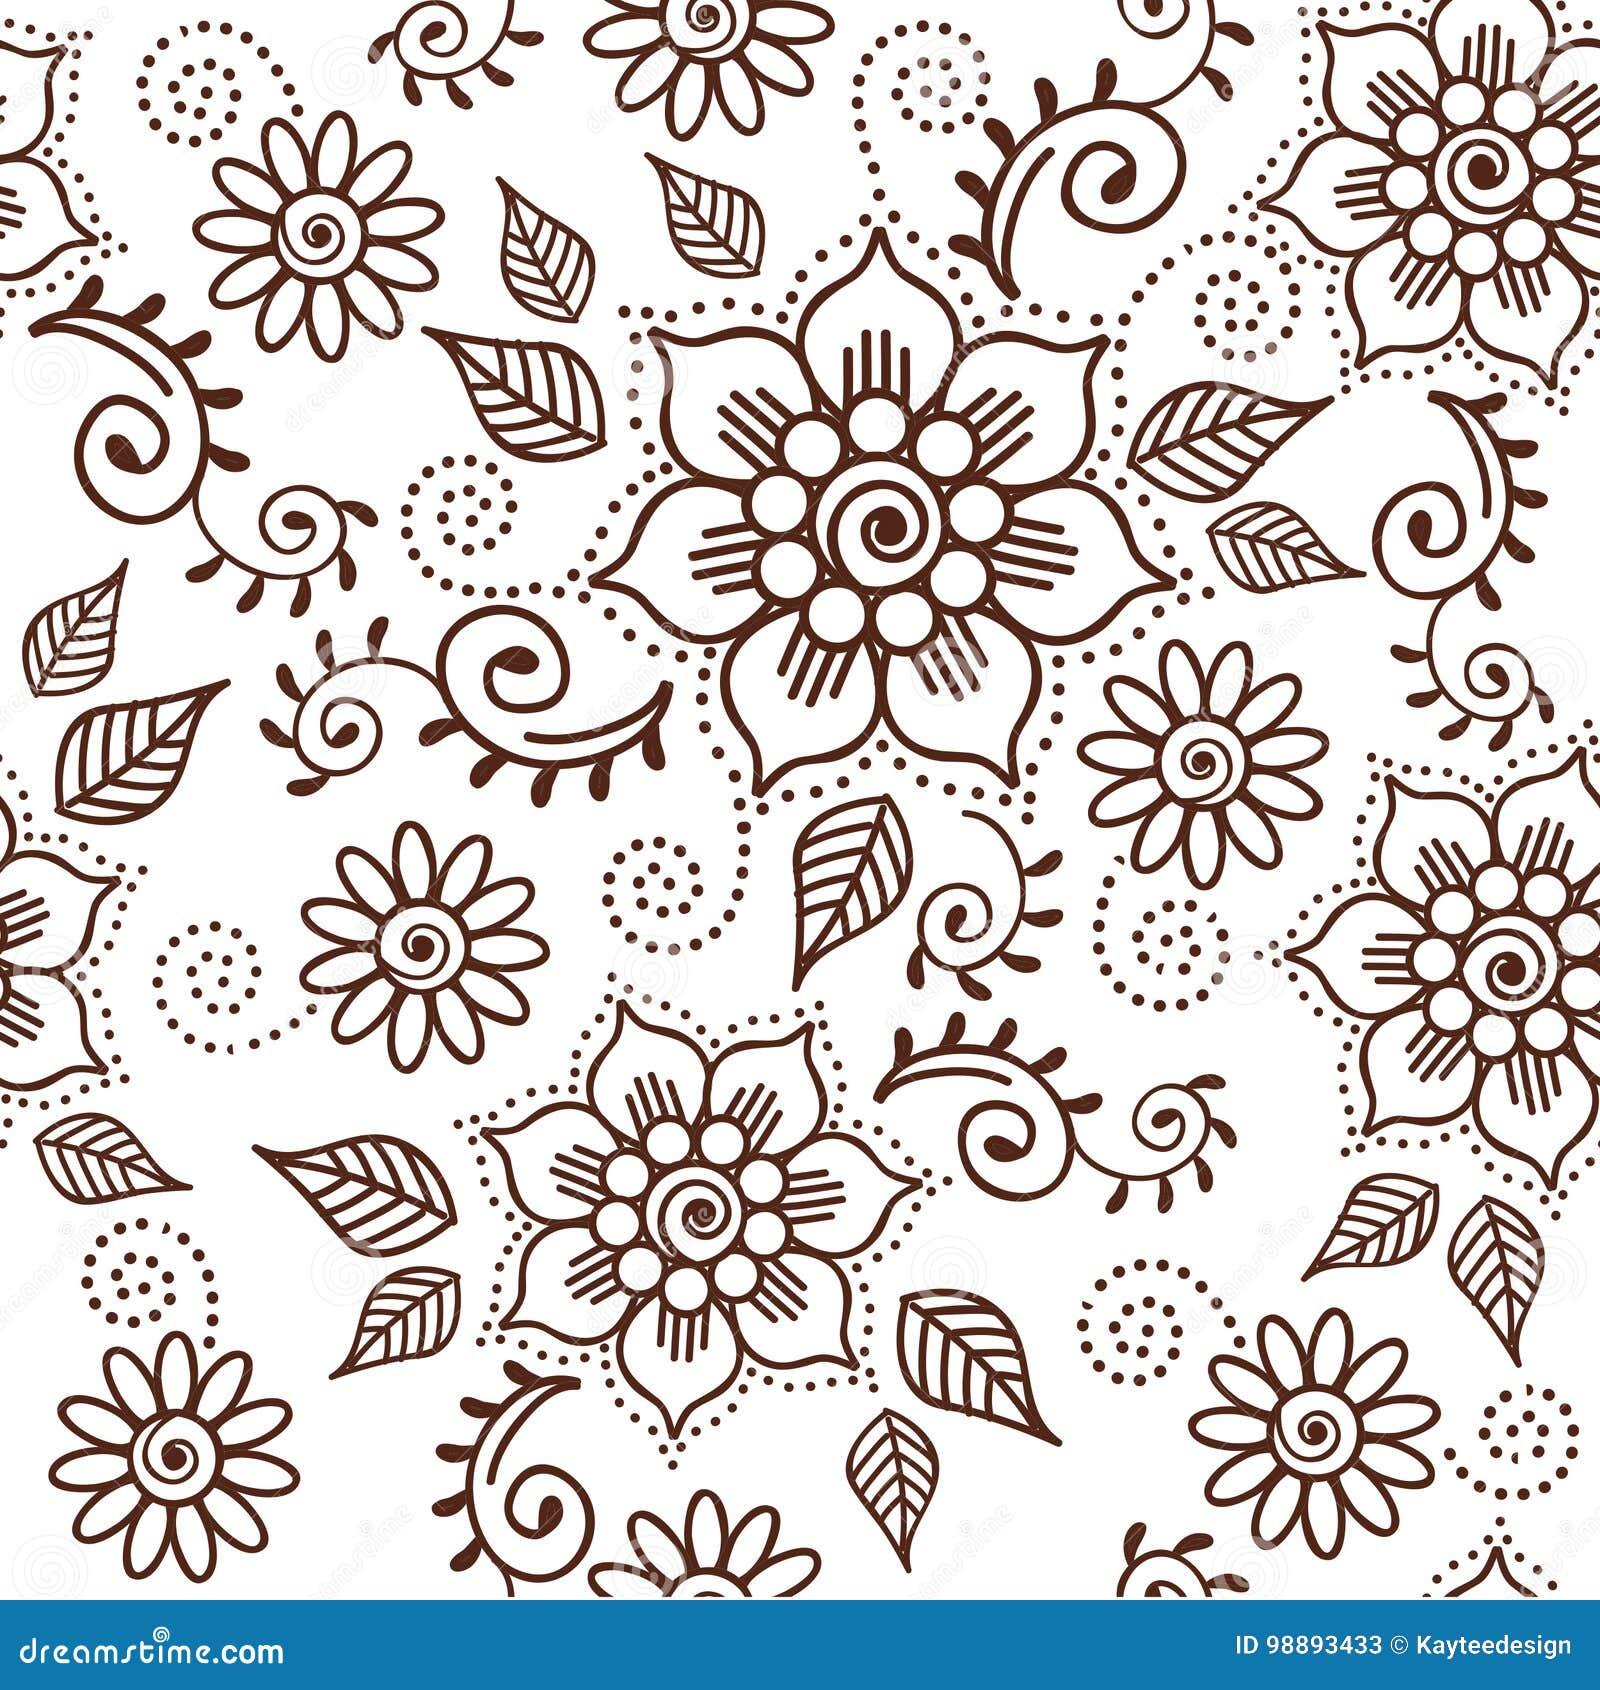 Brown Henna Lotus Repeating Pattern Spiritual Illustration 1 Stock